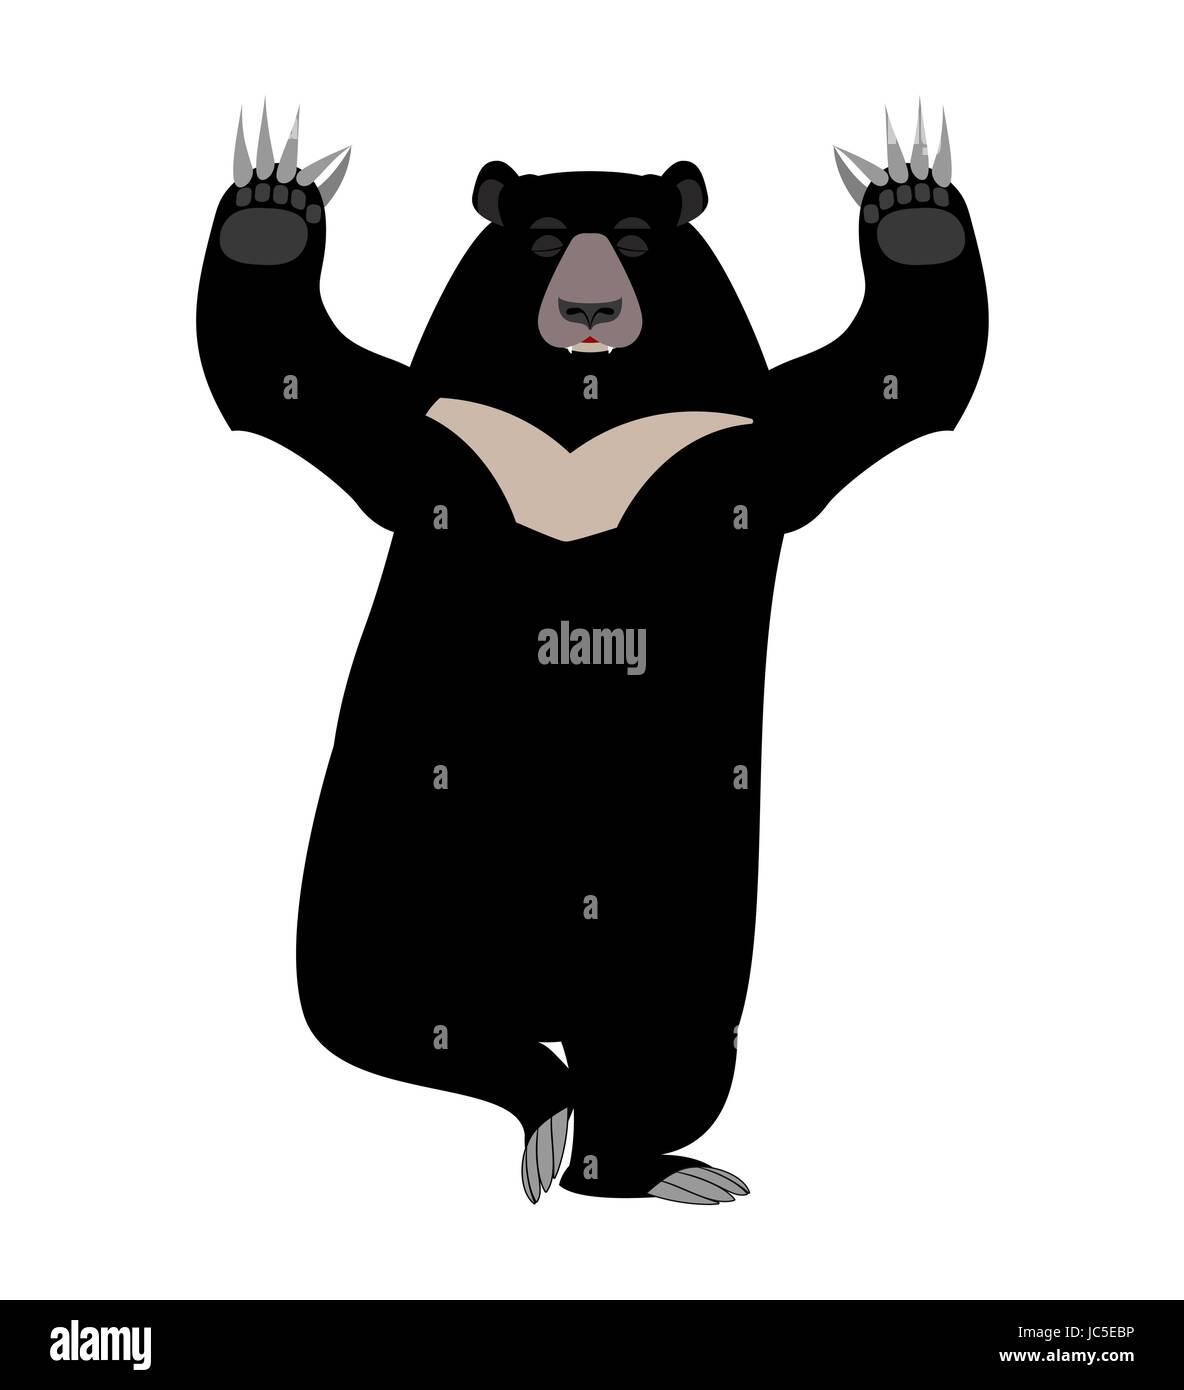 Himalayan bear Yoga. yogi wild animal emoji. Black big beast - Stock Vector